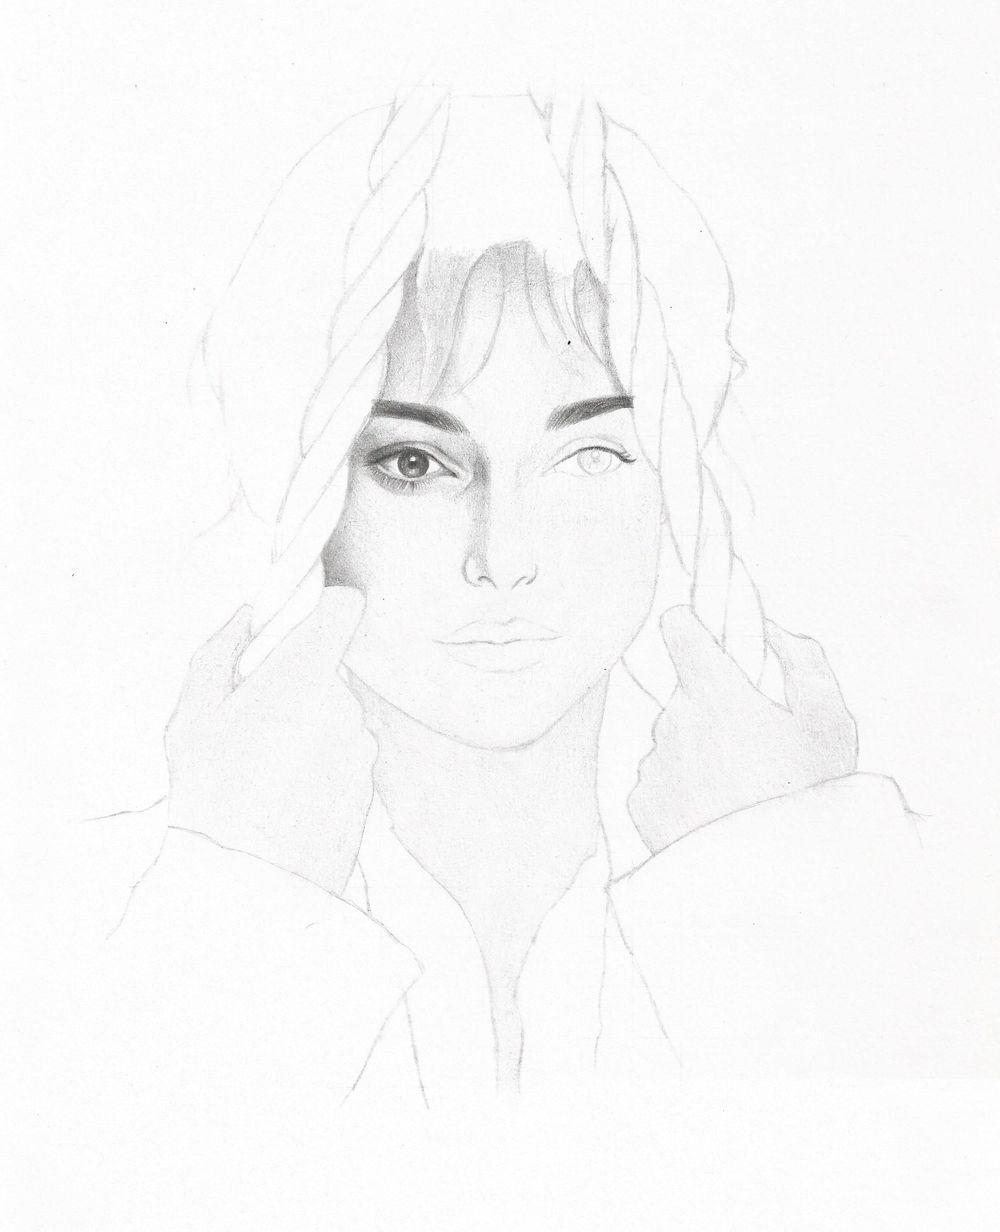 Portrait: Keira Knightley as Elizabeth Bennet - image 2 - student project